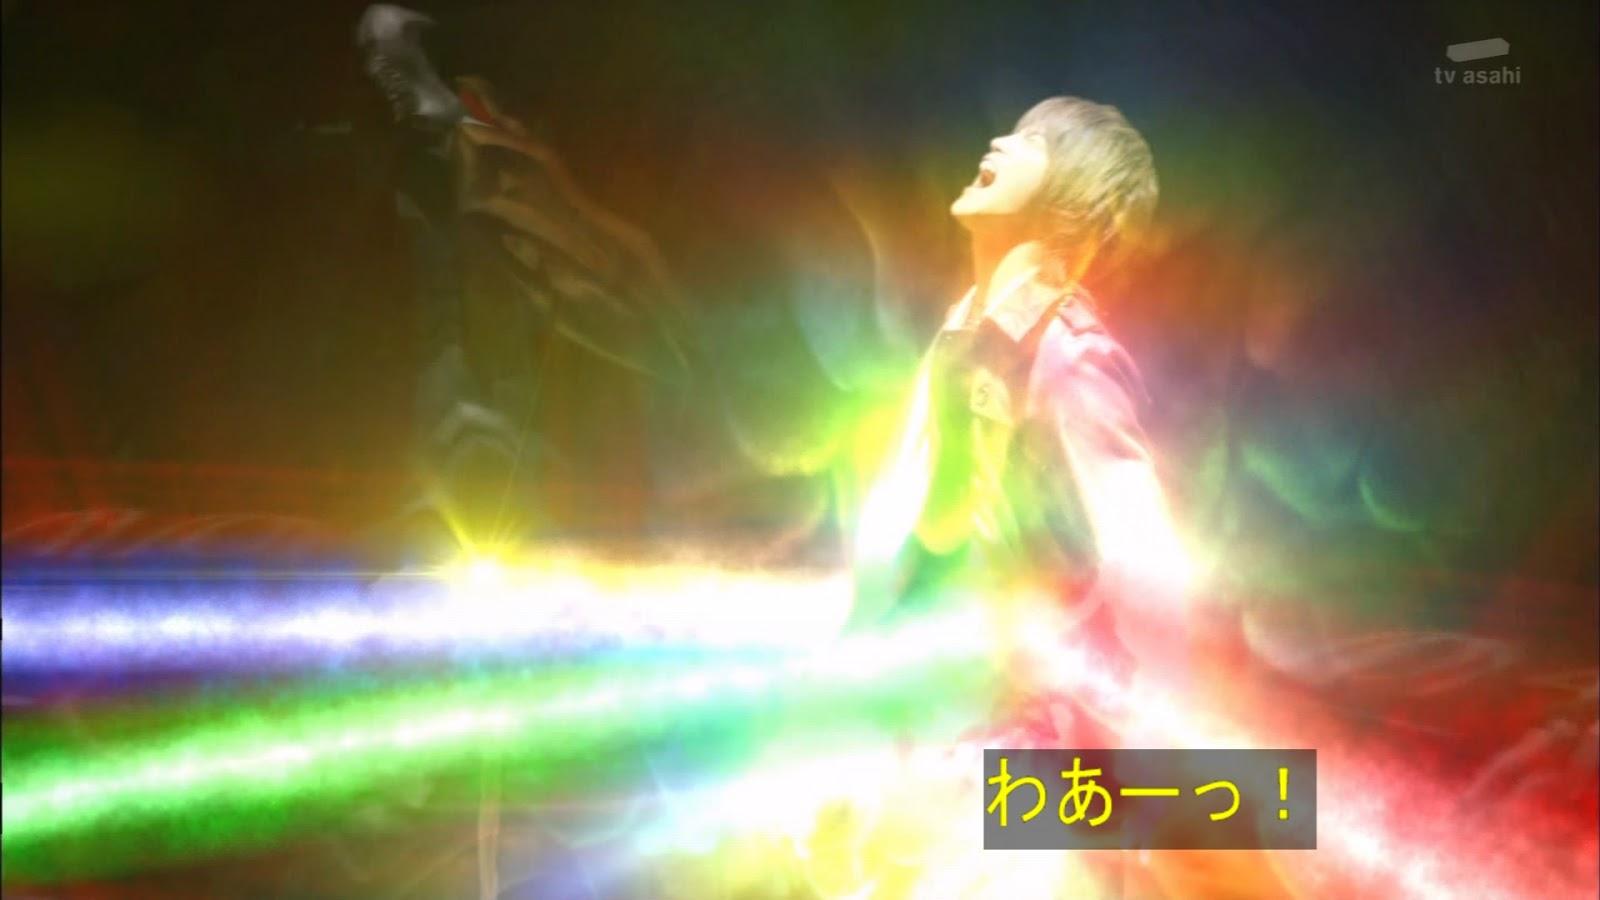 Henshin fever kamen rider wizard episode 6 - Cinema